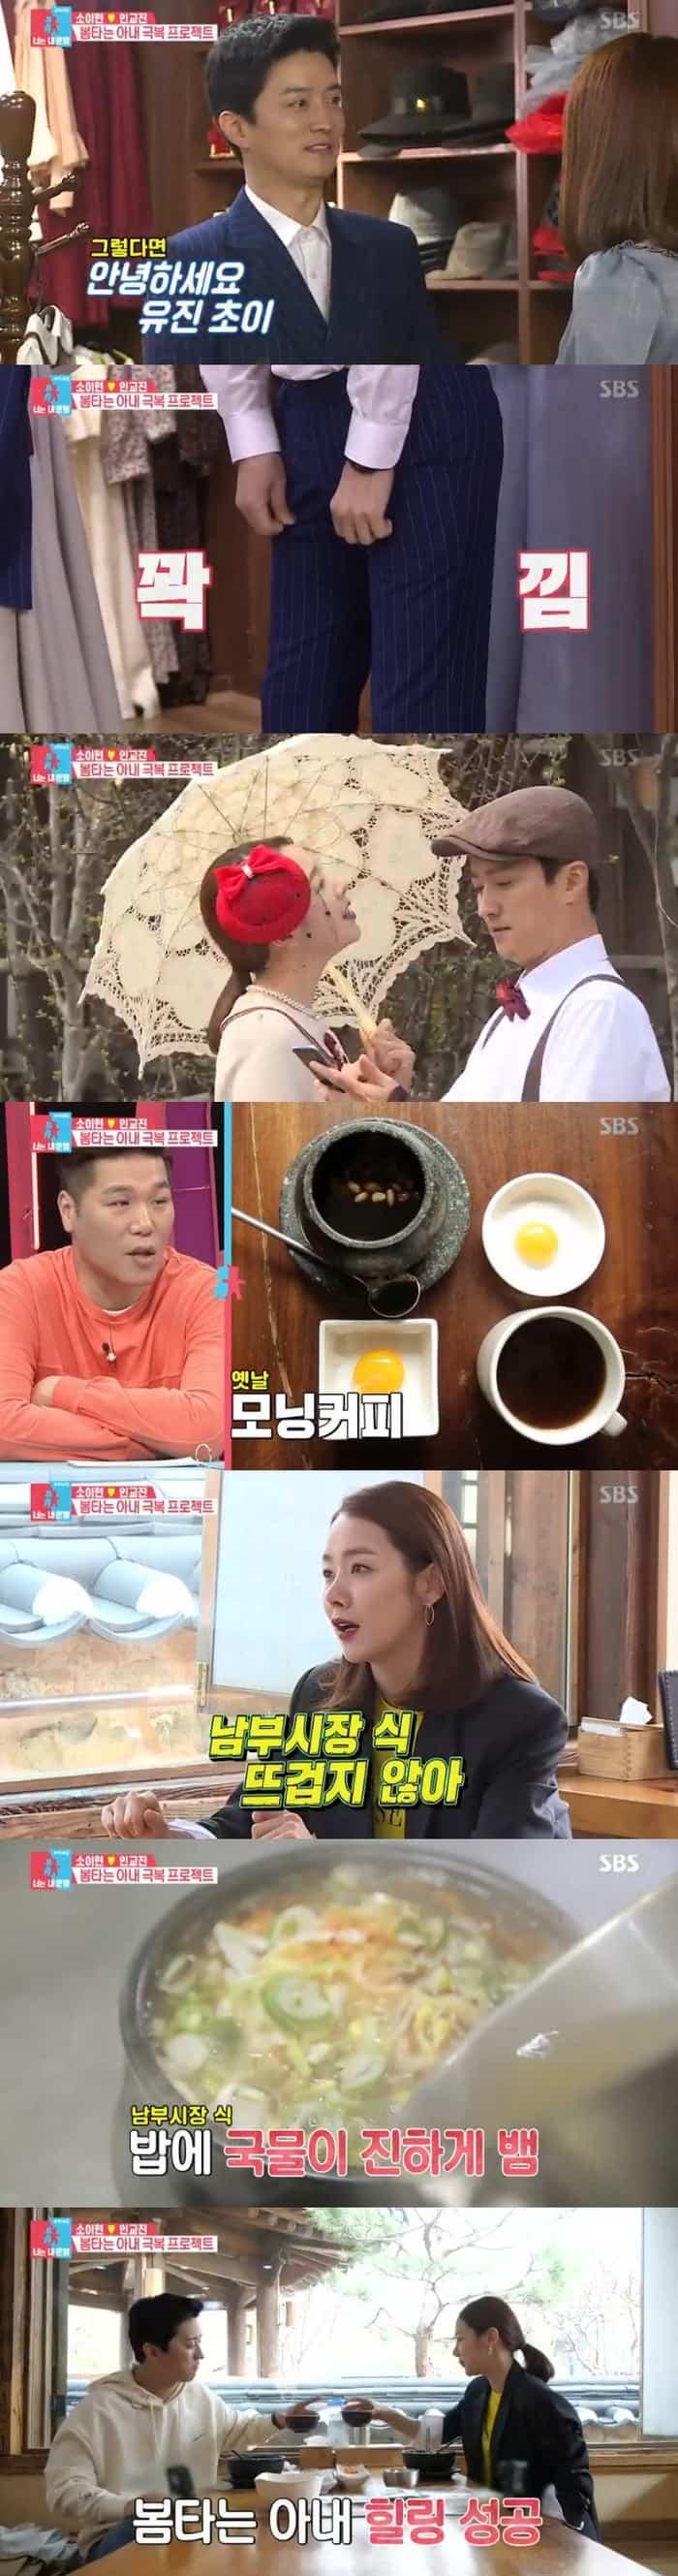 [RE:TV] '동상이몽2' 인교진♥소이현, 러블리 부부의 '힐링여행